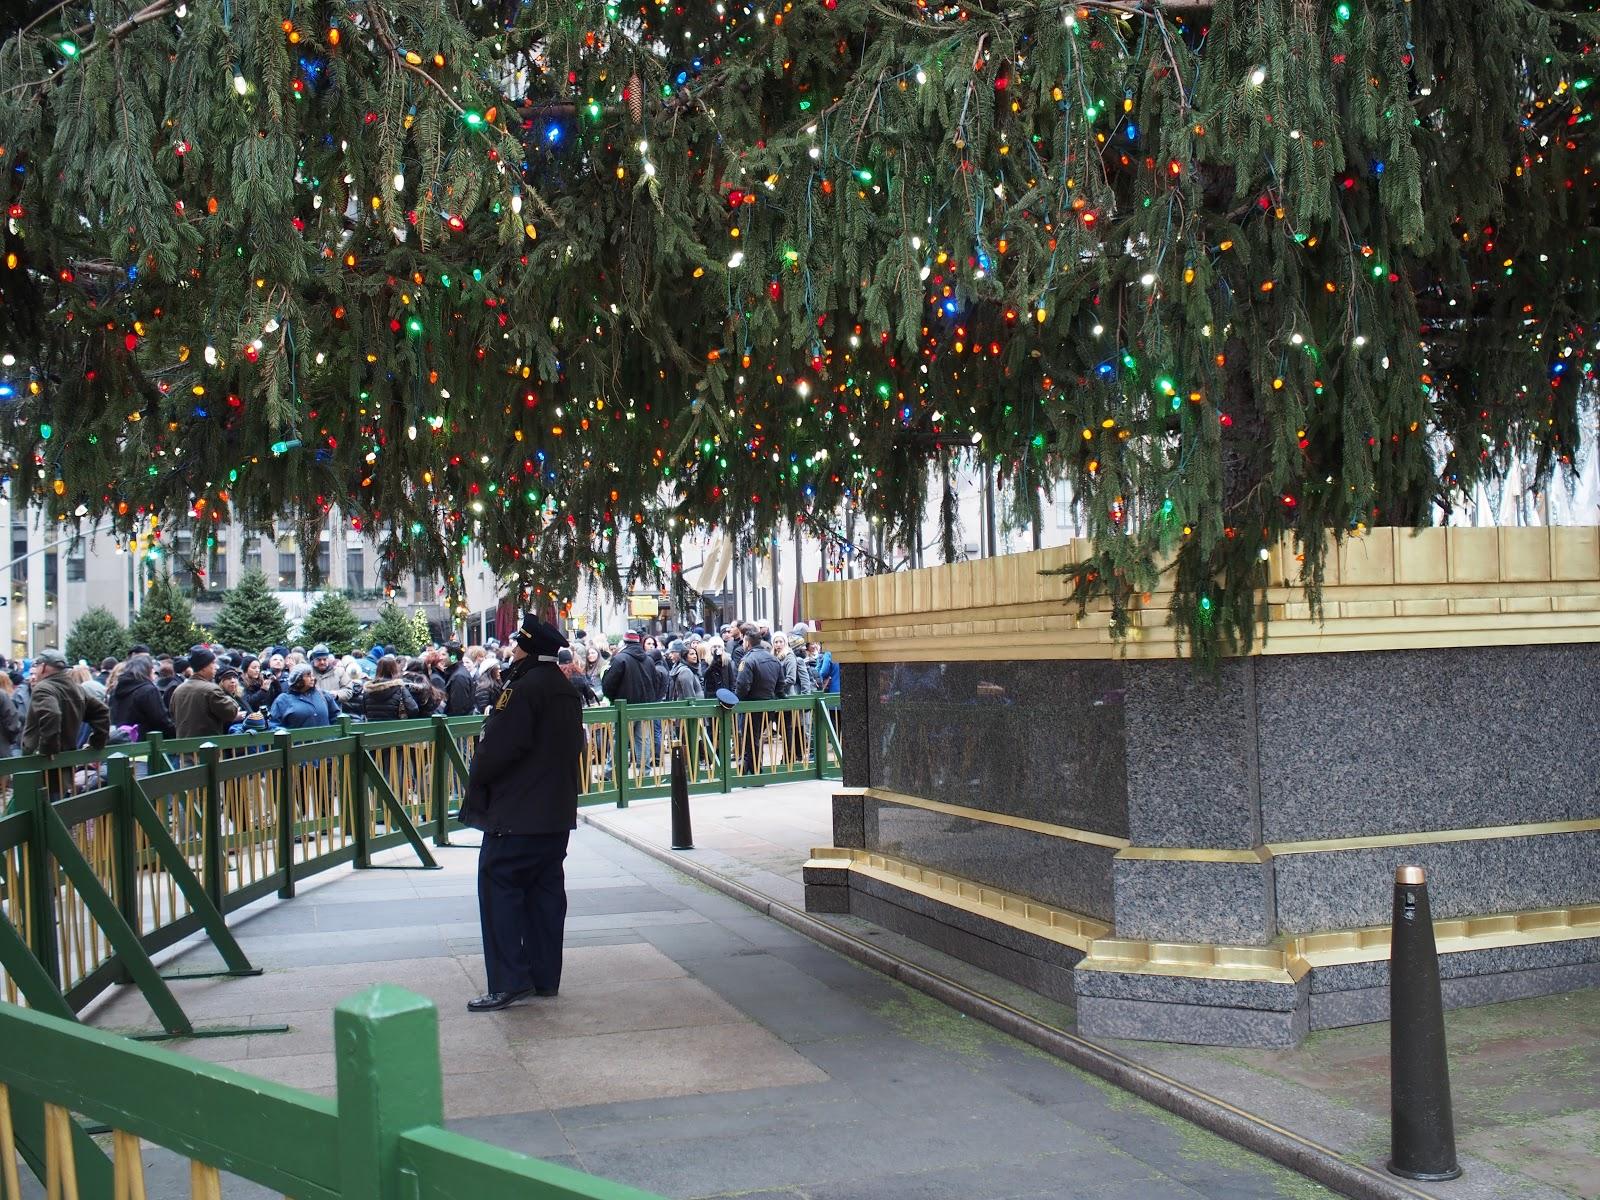 Tree Guard #treeguard  #holidays #holidaysinNYC #rockefellercenter #NYC ©2014 Nancy Lundebjerg